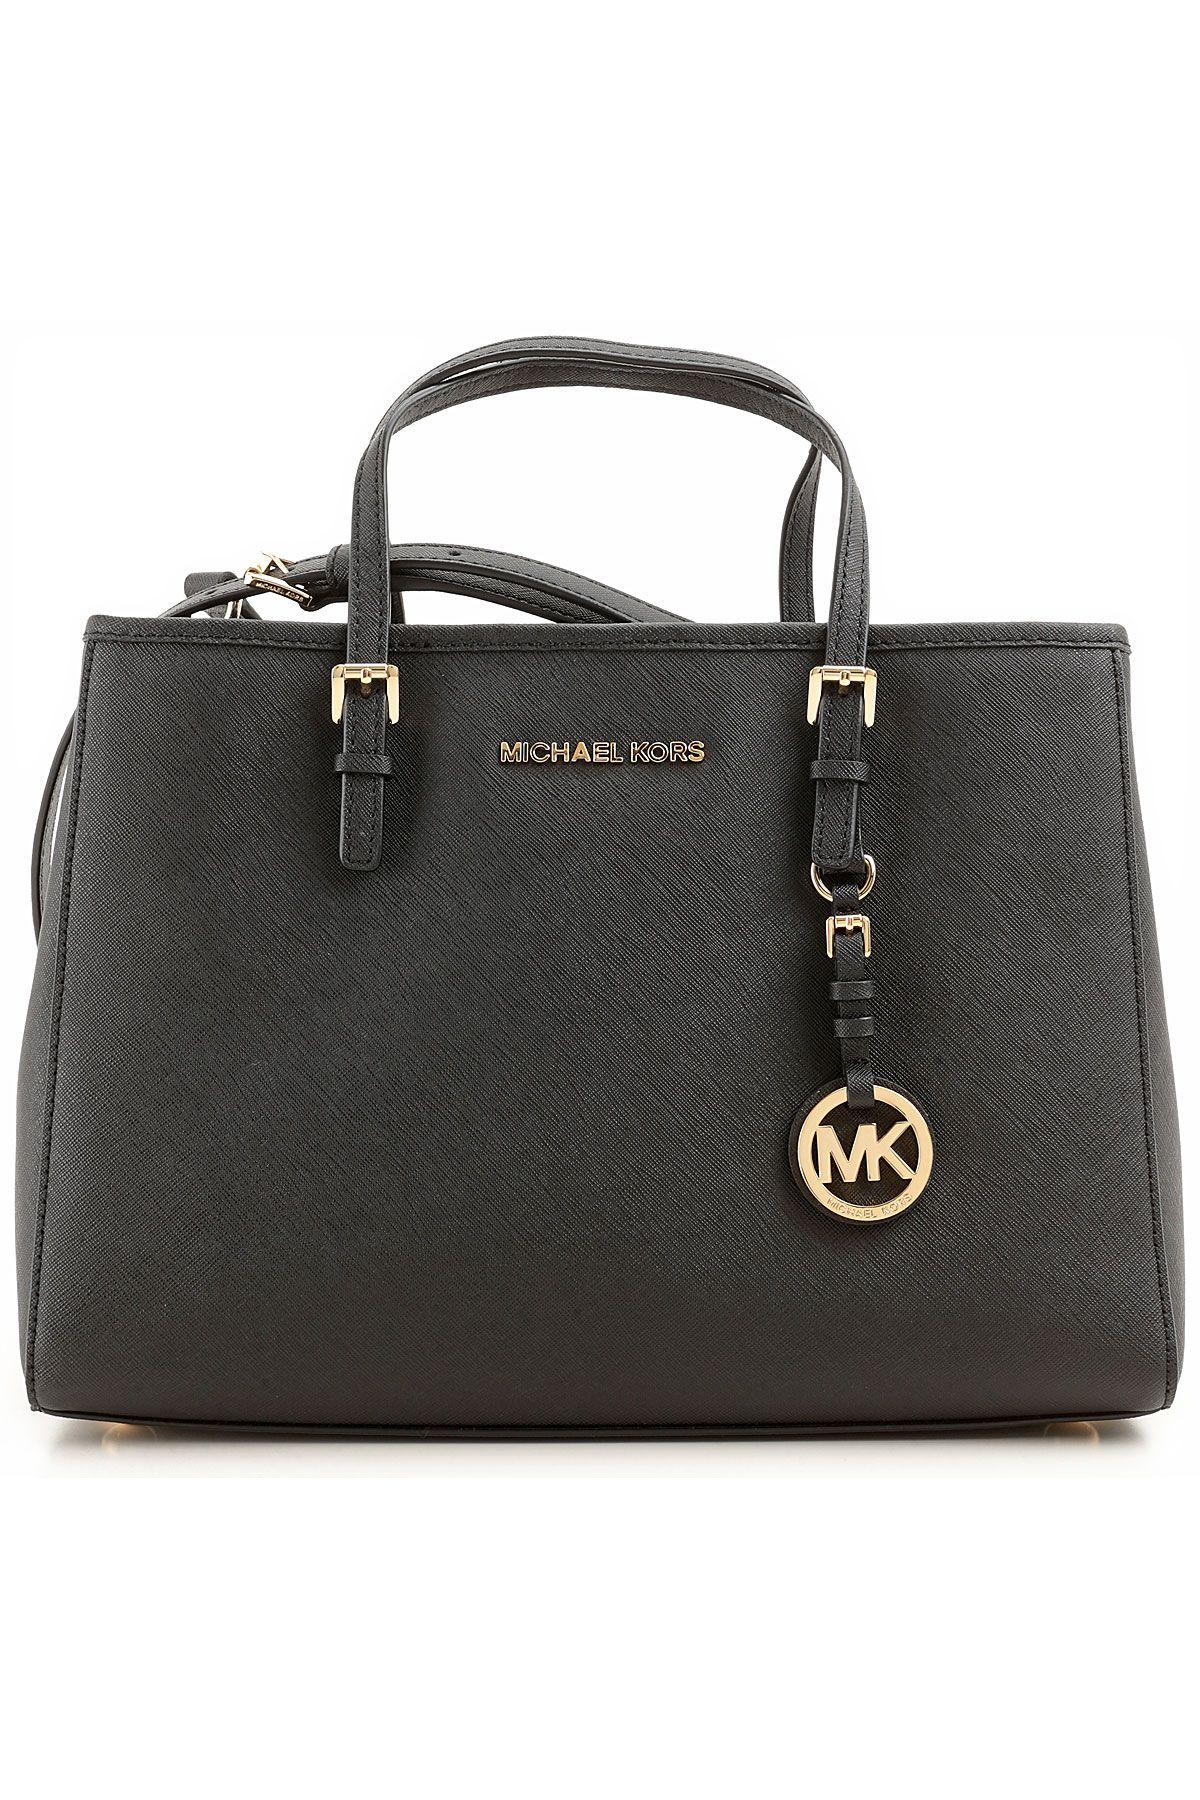 mk bags 2013